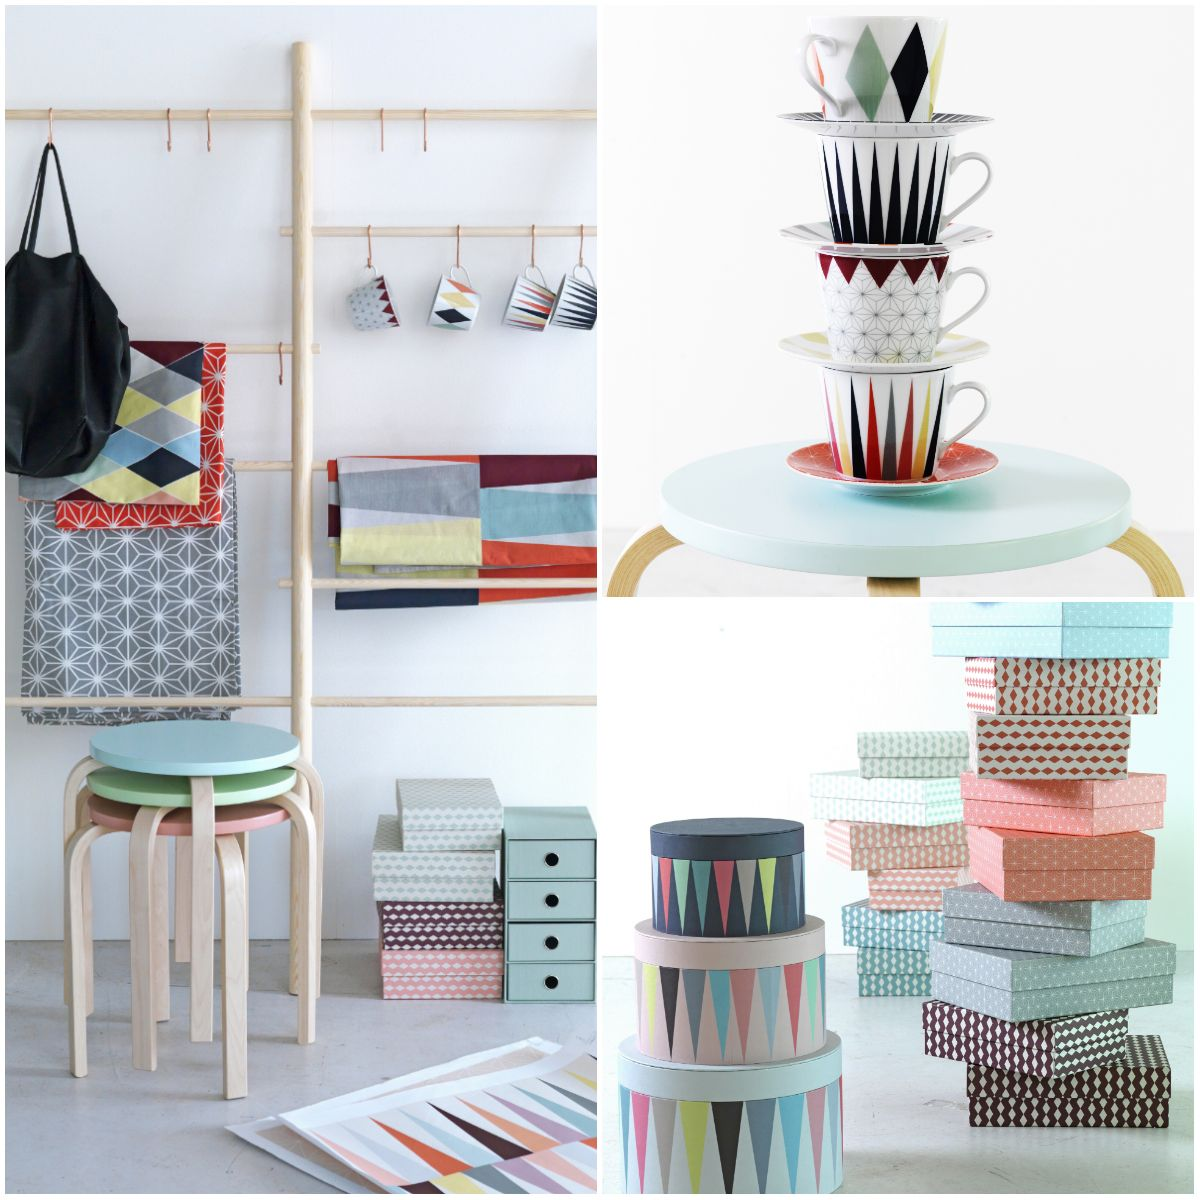 IKEA BRÅKIG: Rebellische Designfreude   Pinspiration